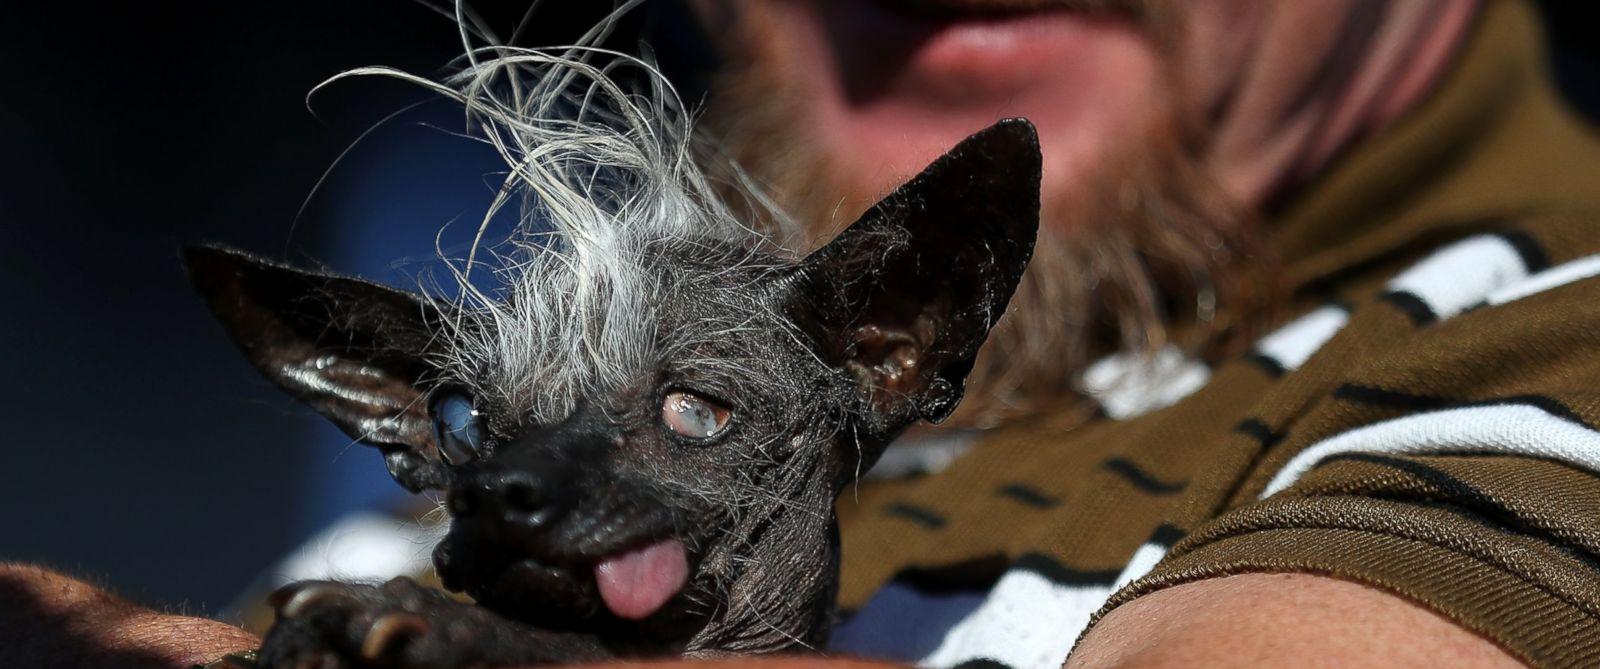 The World S Ugliest Dog Is Crowned Meet Sweepee Rambo